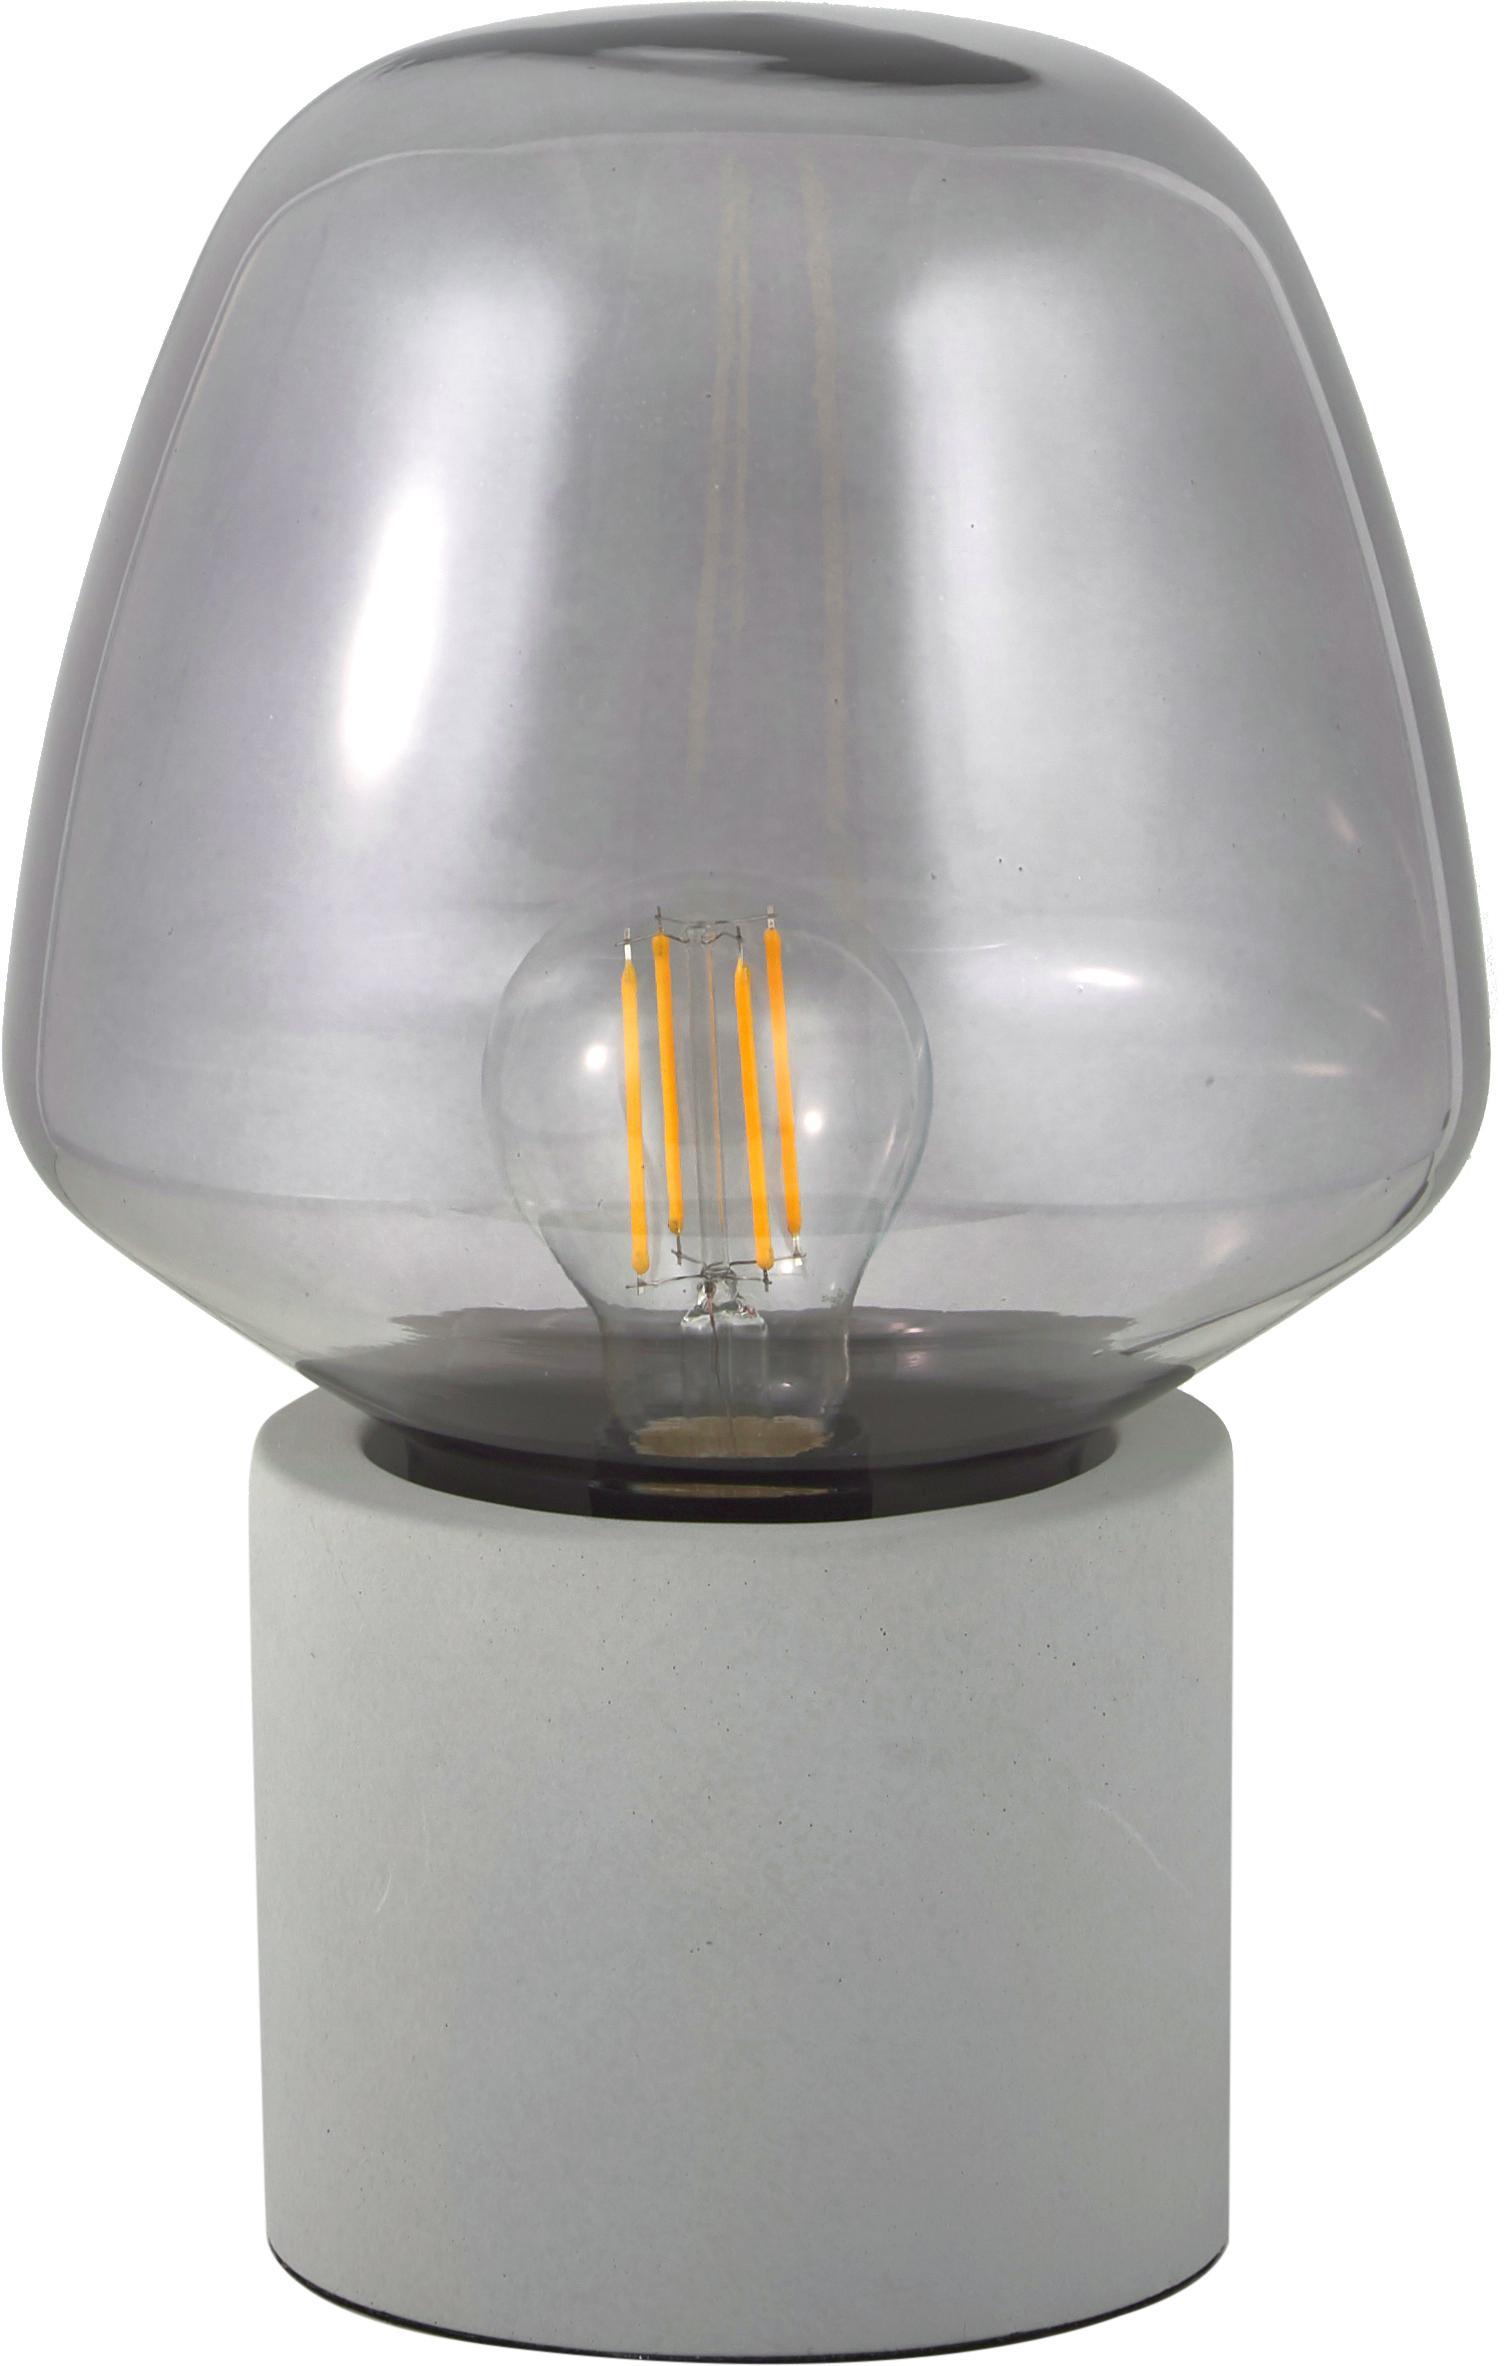 Lámpara de mesa pequeña Christina, Pantalla: vidrio, Cable: plástico, Gris cemento, gris, transparente, Ø 20 x Al 30 cm